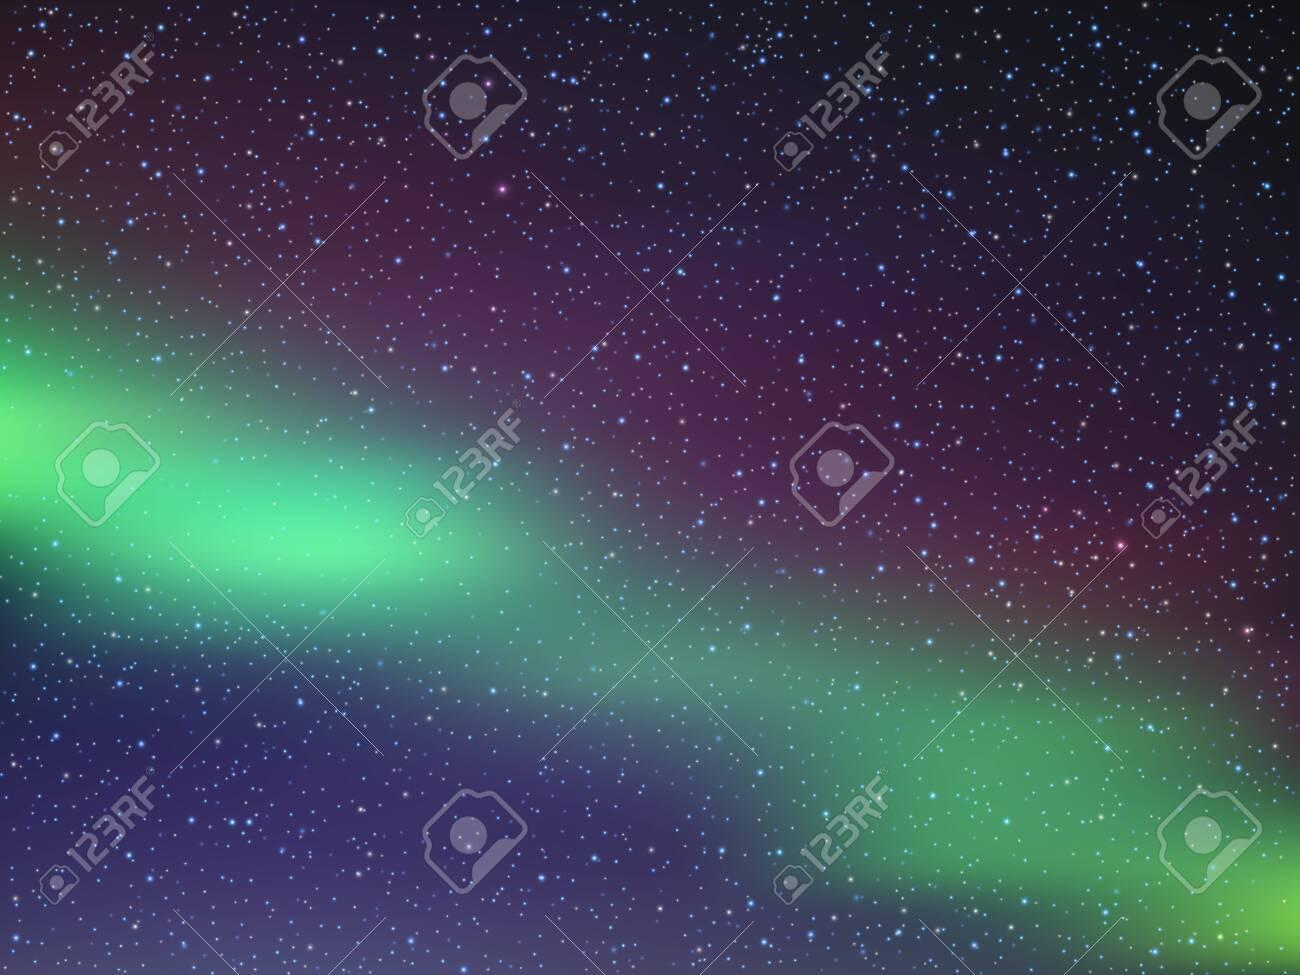 Night sky with stars. Northern lights. Vector illustration EPS10 - 135349144